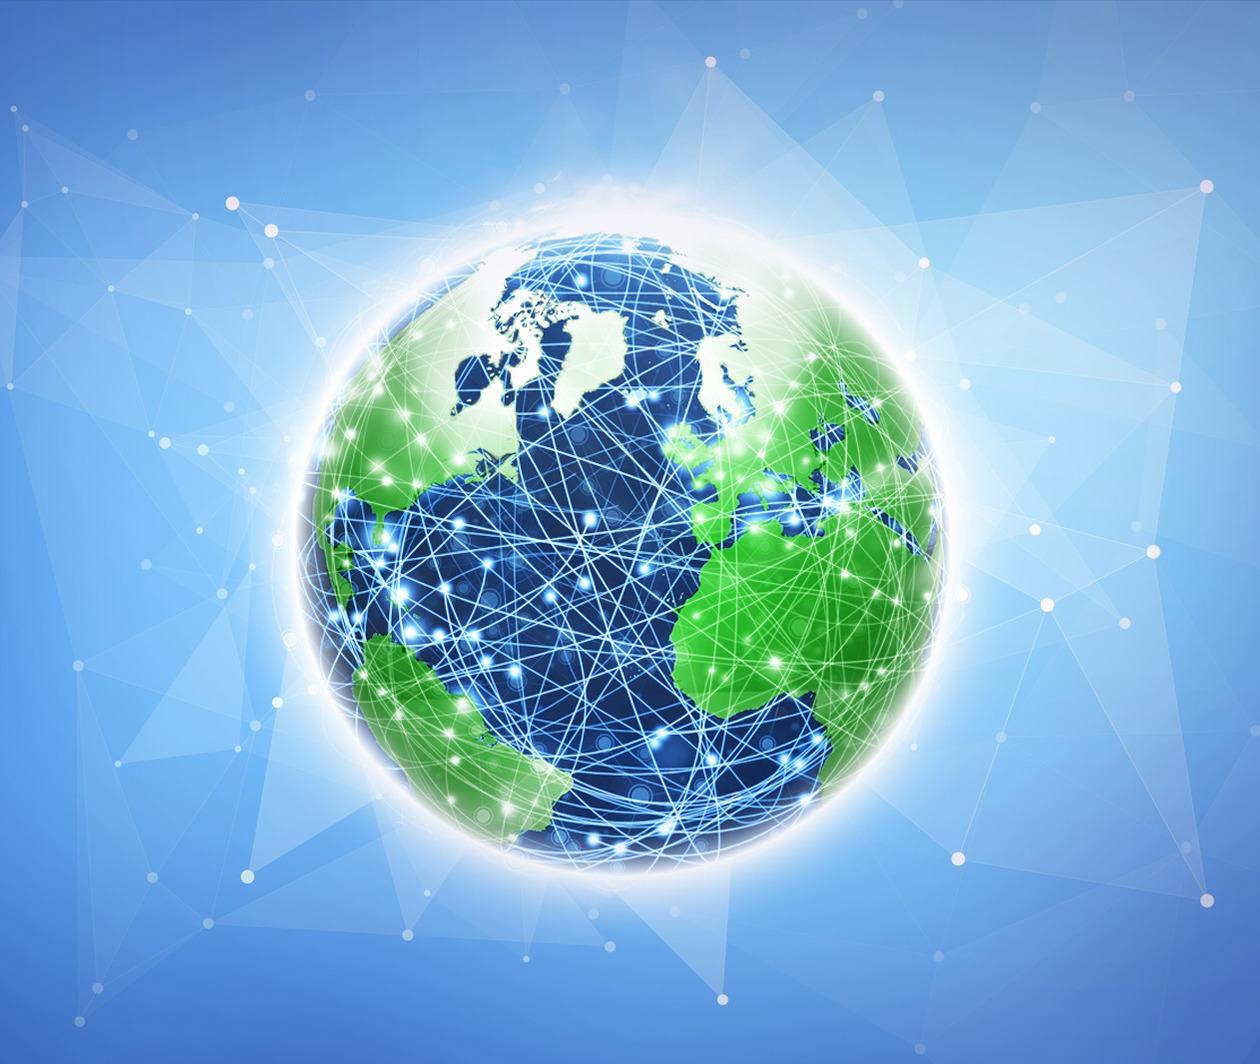 Predictive Analytics: Gaining Insights from Big Data